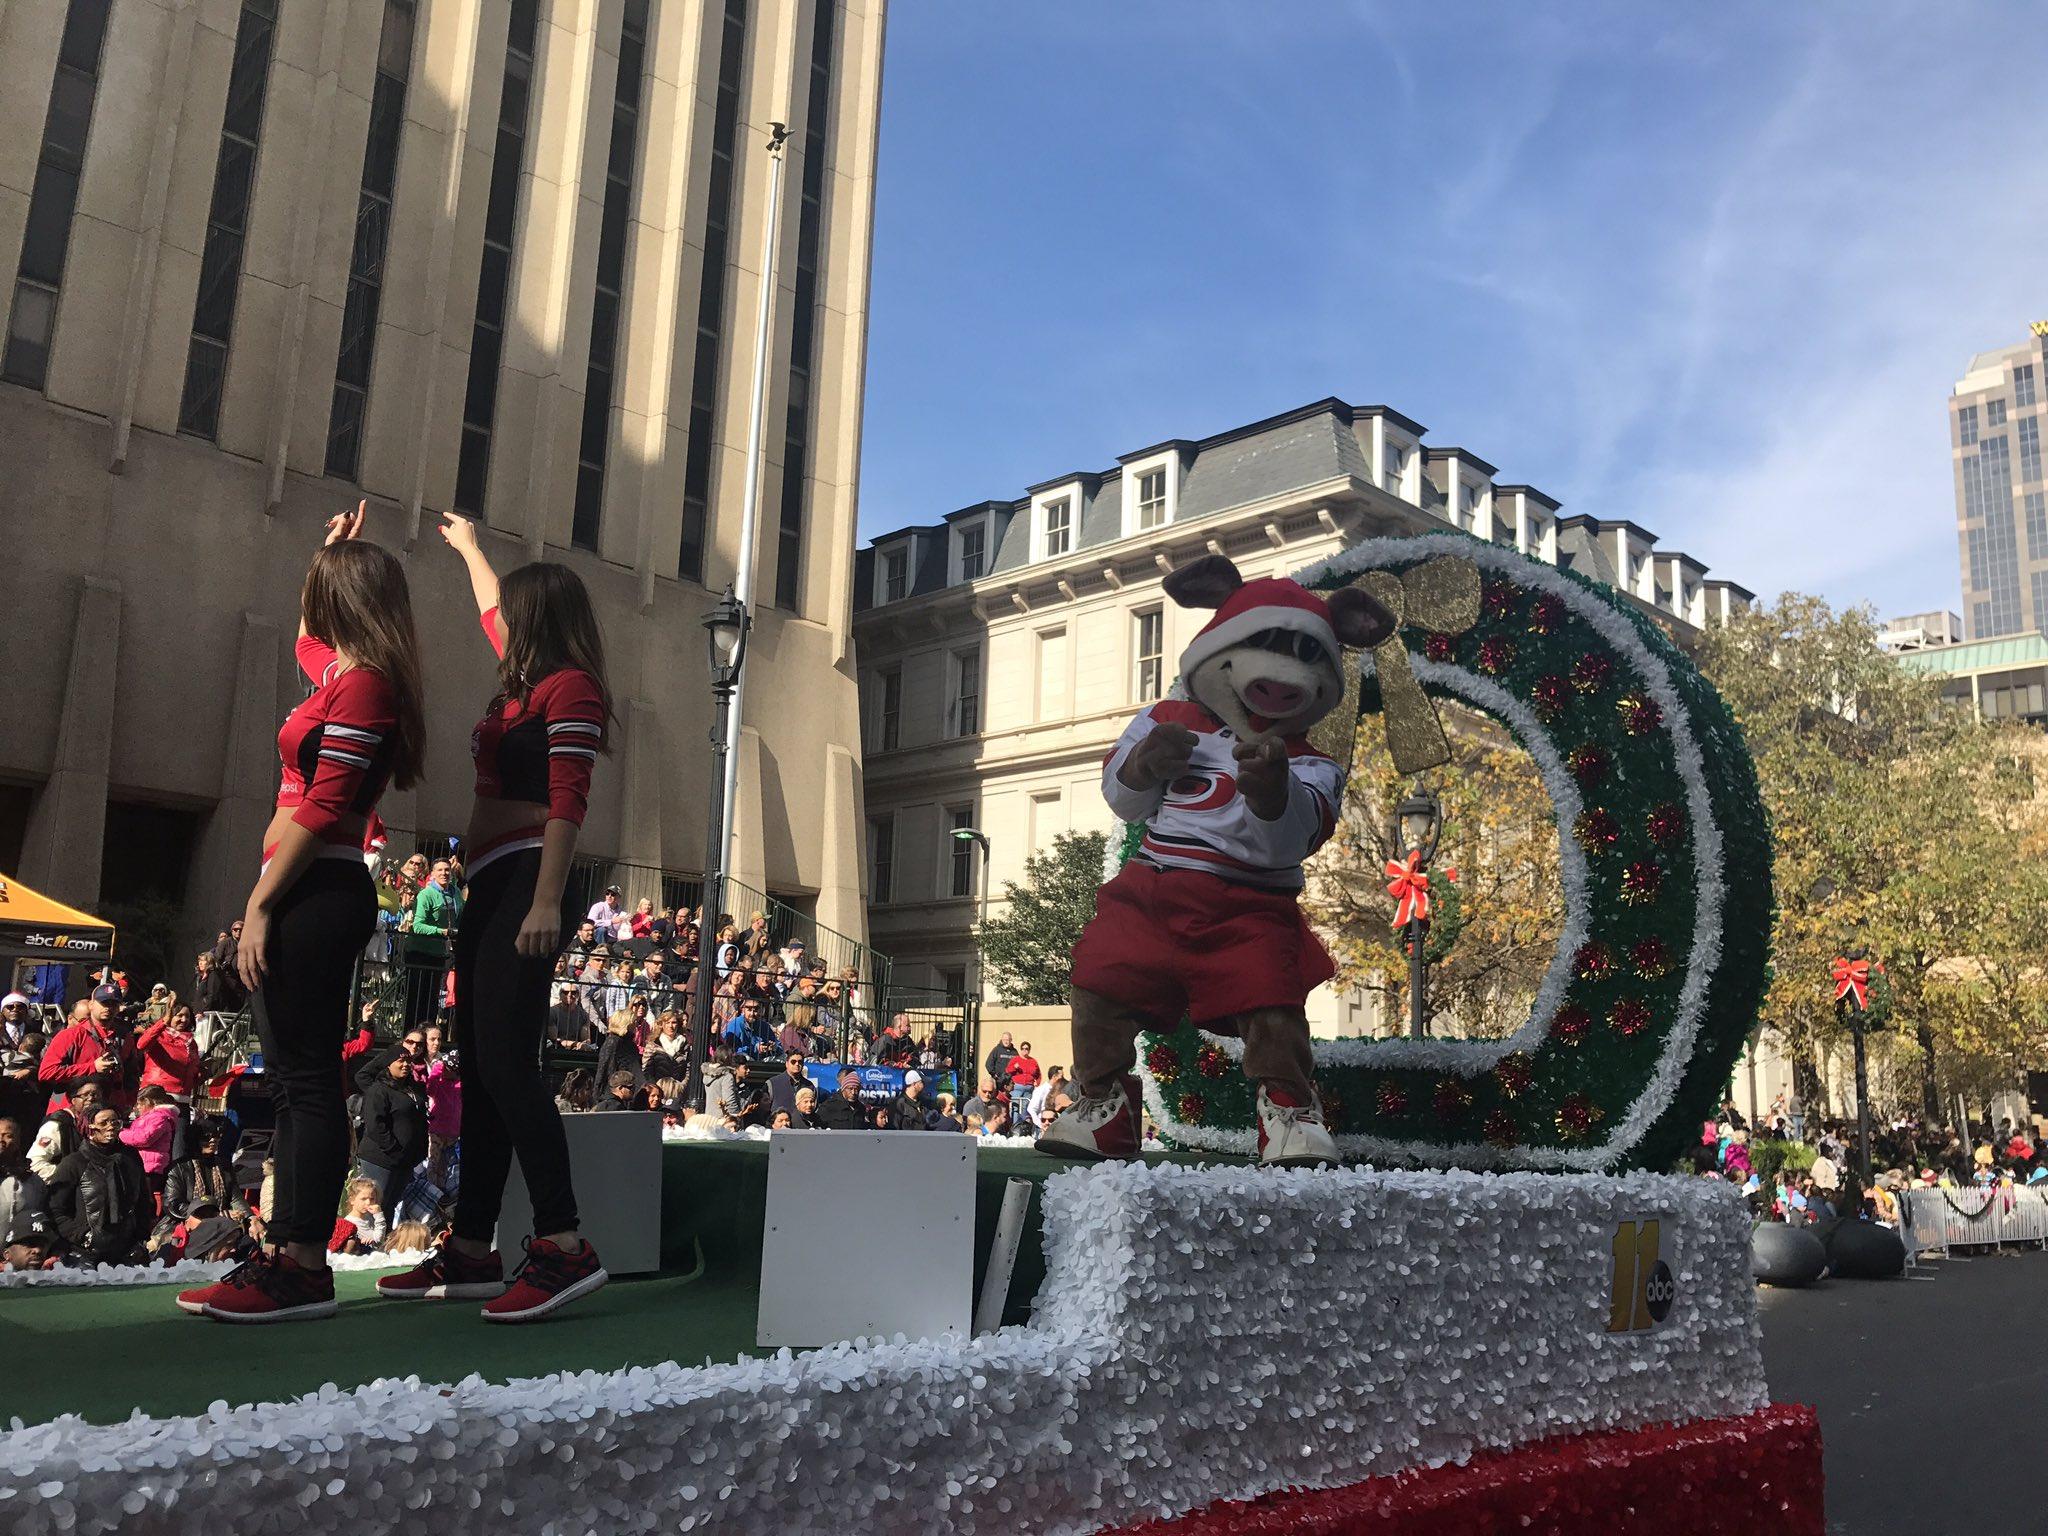 Christmas Craigslist 2020 2020 Christmas Parade Fayetteville Nc Craigslist | Aqzaes